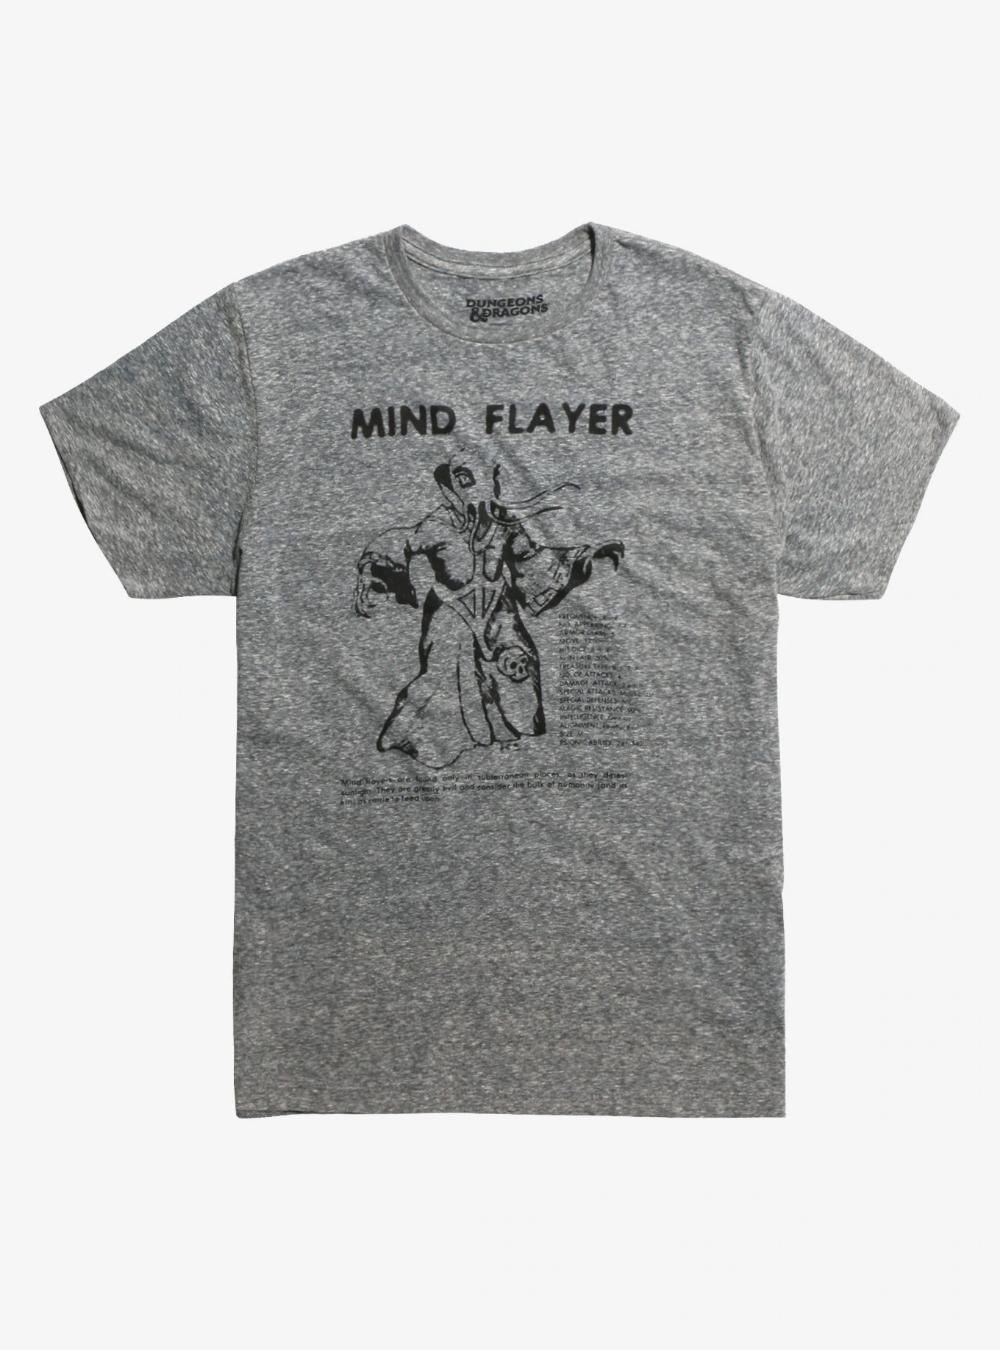 Dungeons Dragons Mind Flayer T Shirt Mind Flayer Dungeons And Dragons Cool T Shirts